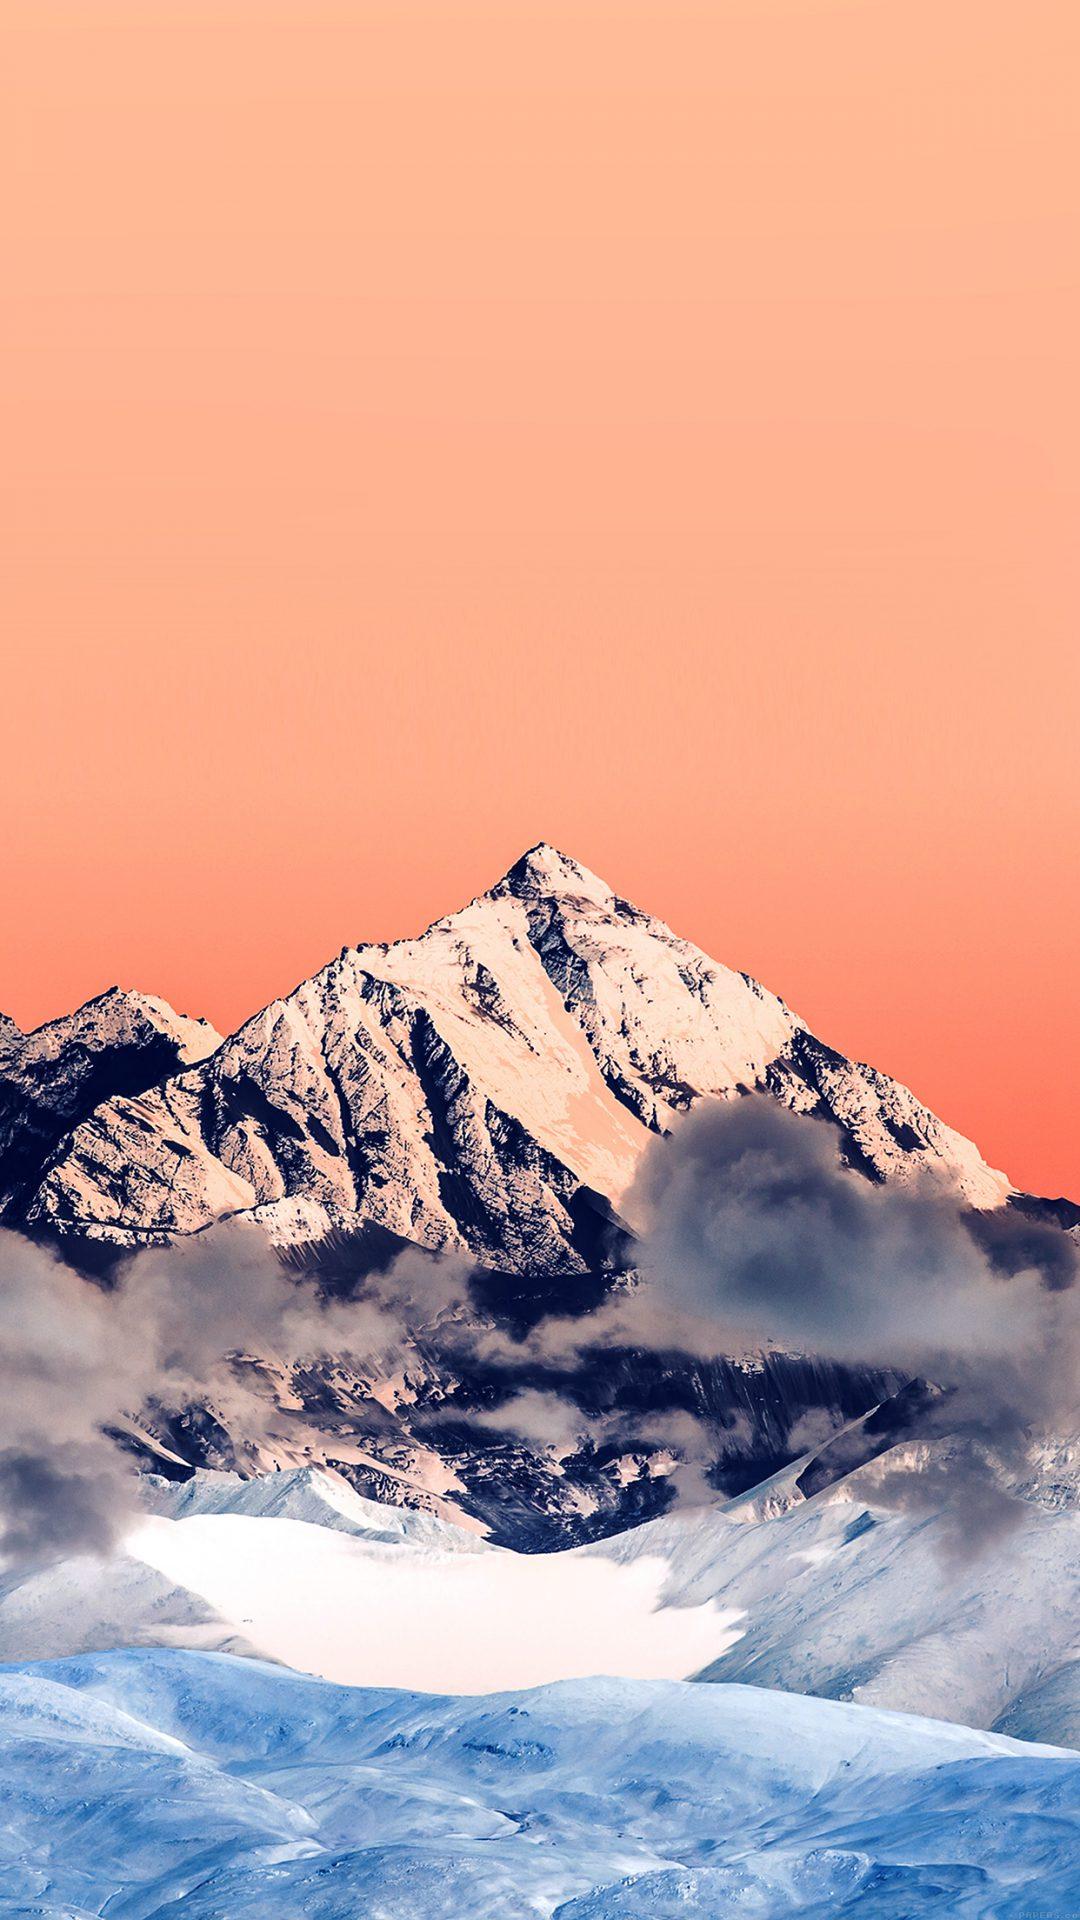 Snow Solo Orange Mountain High Nature